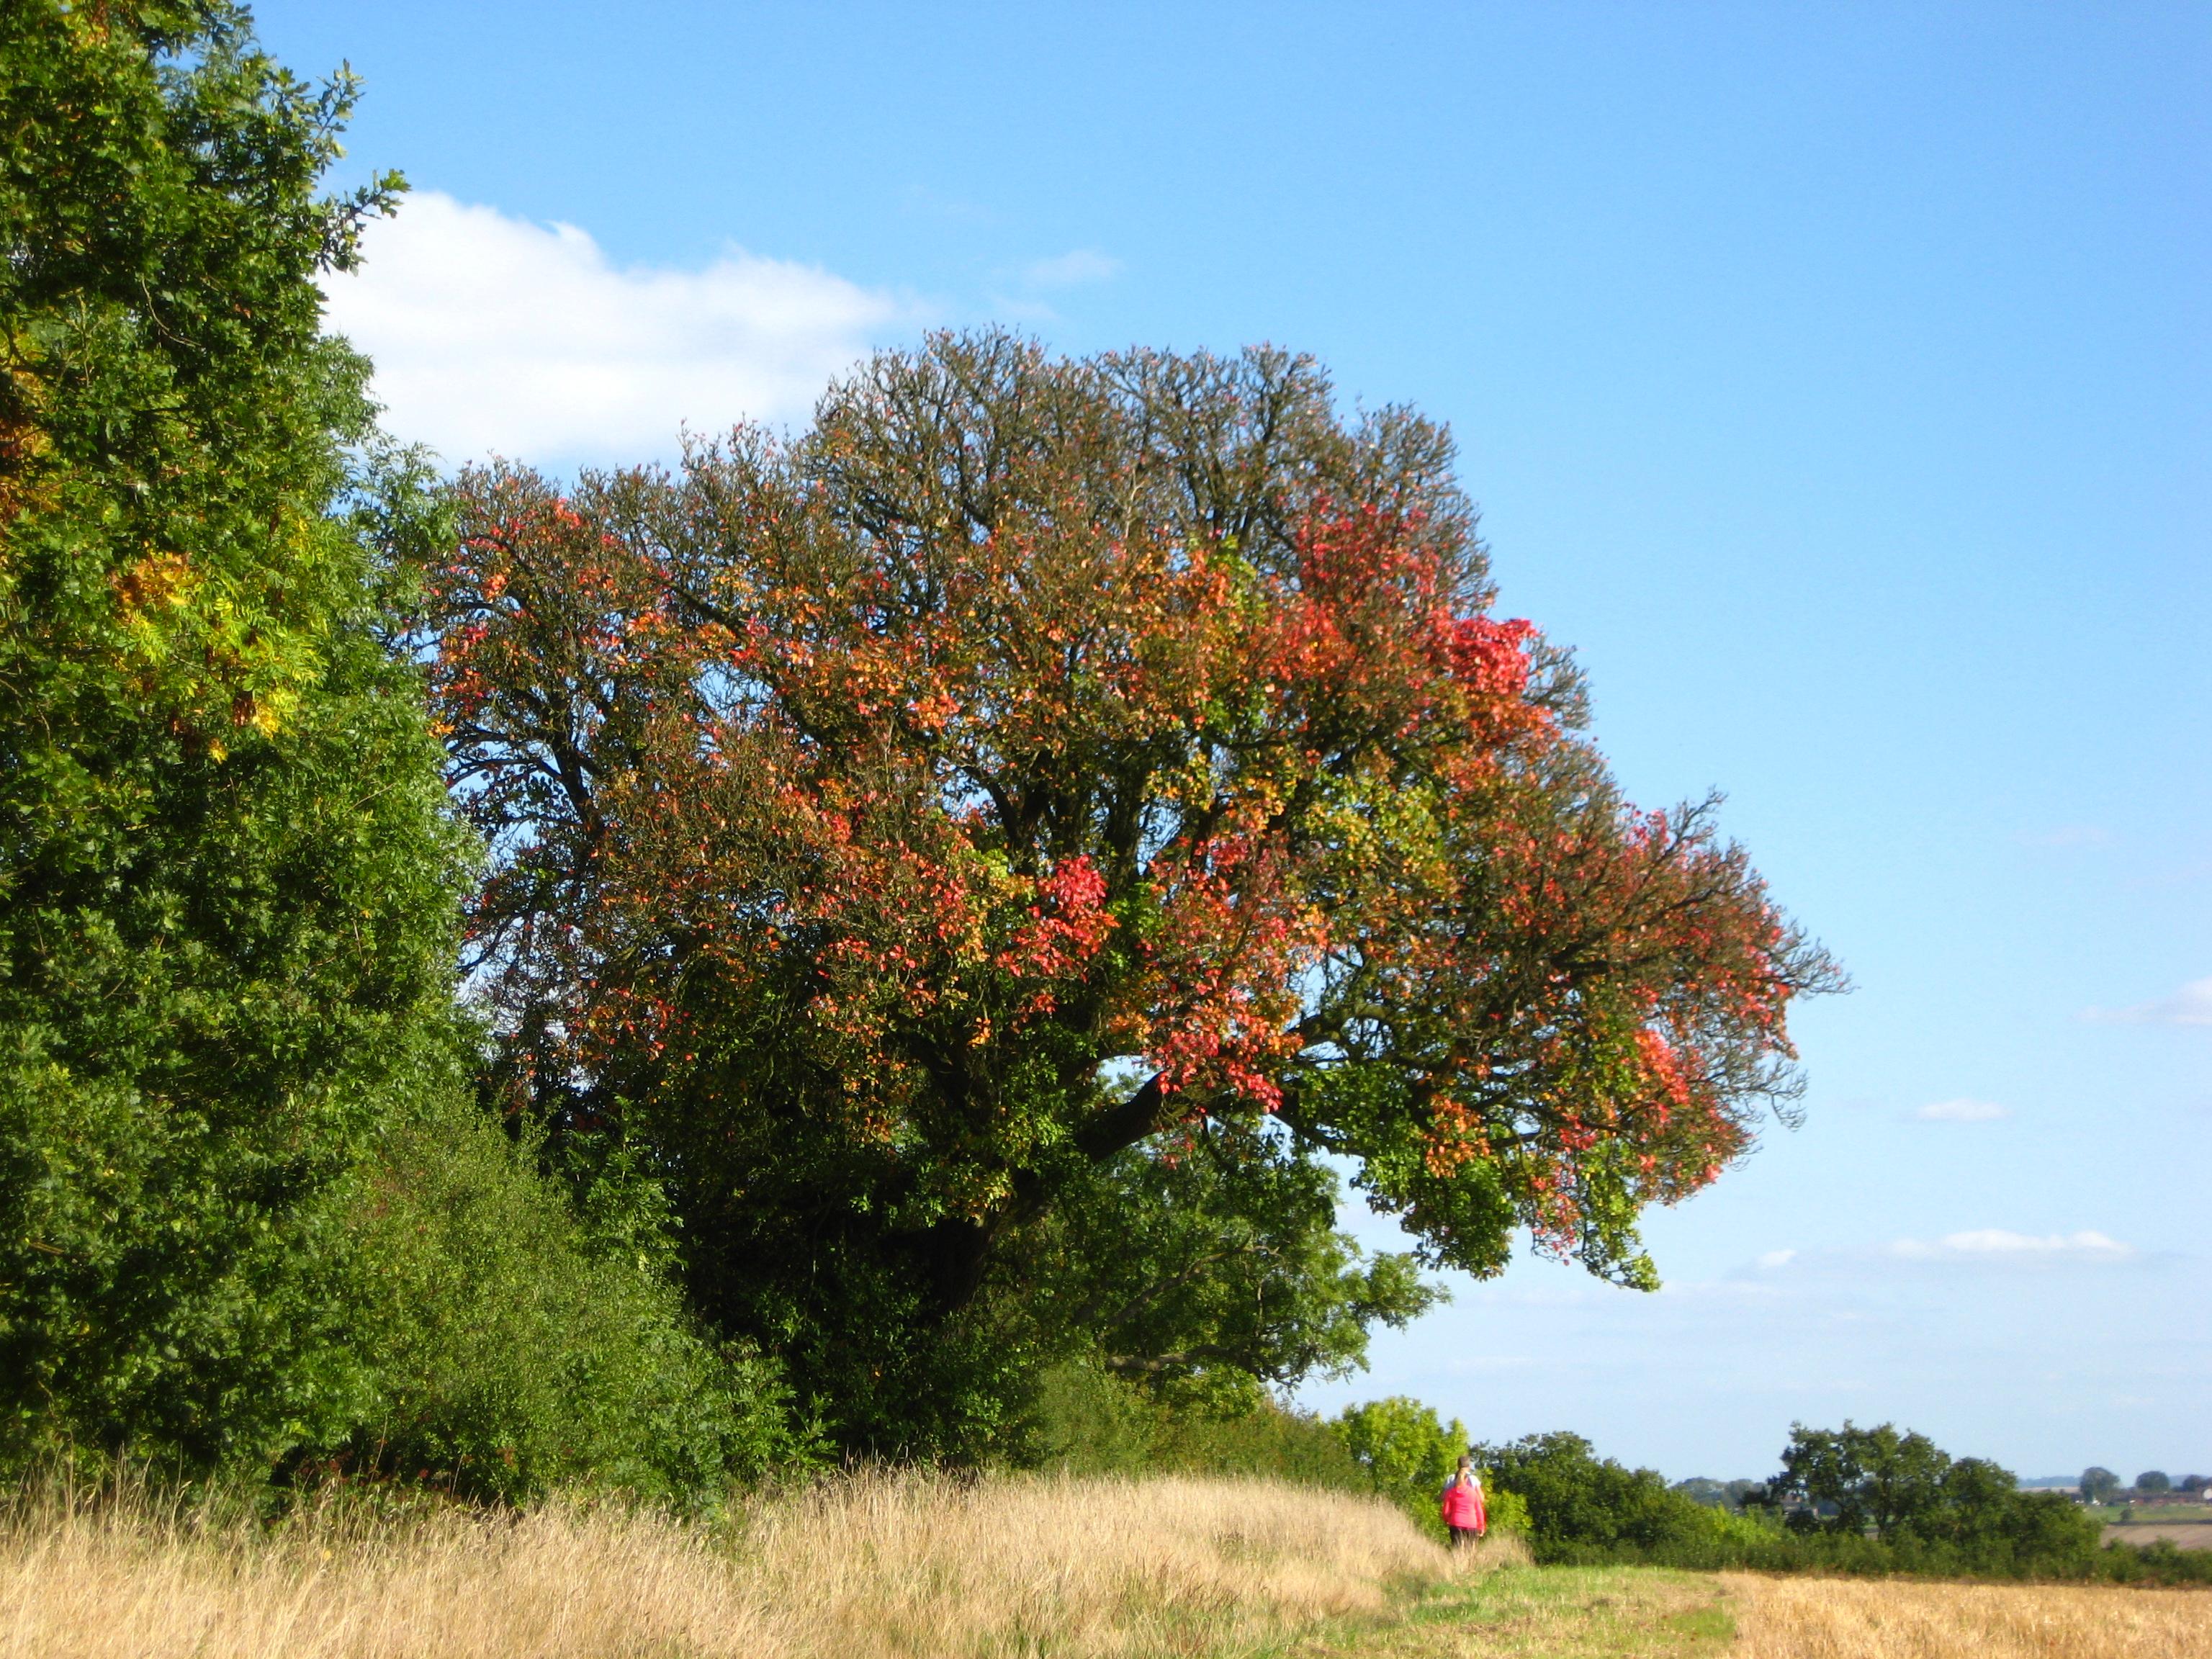 Cubbington Pear Tree